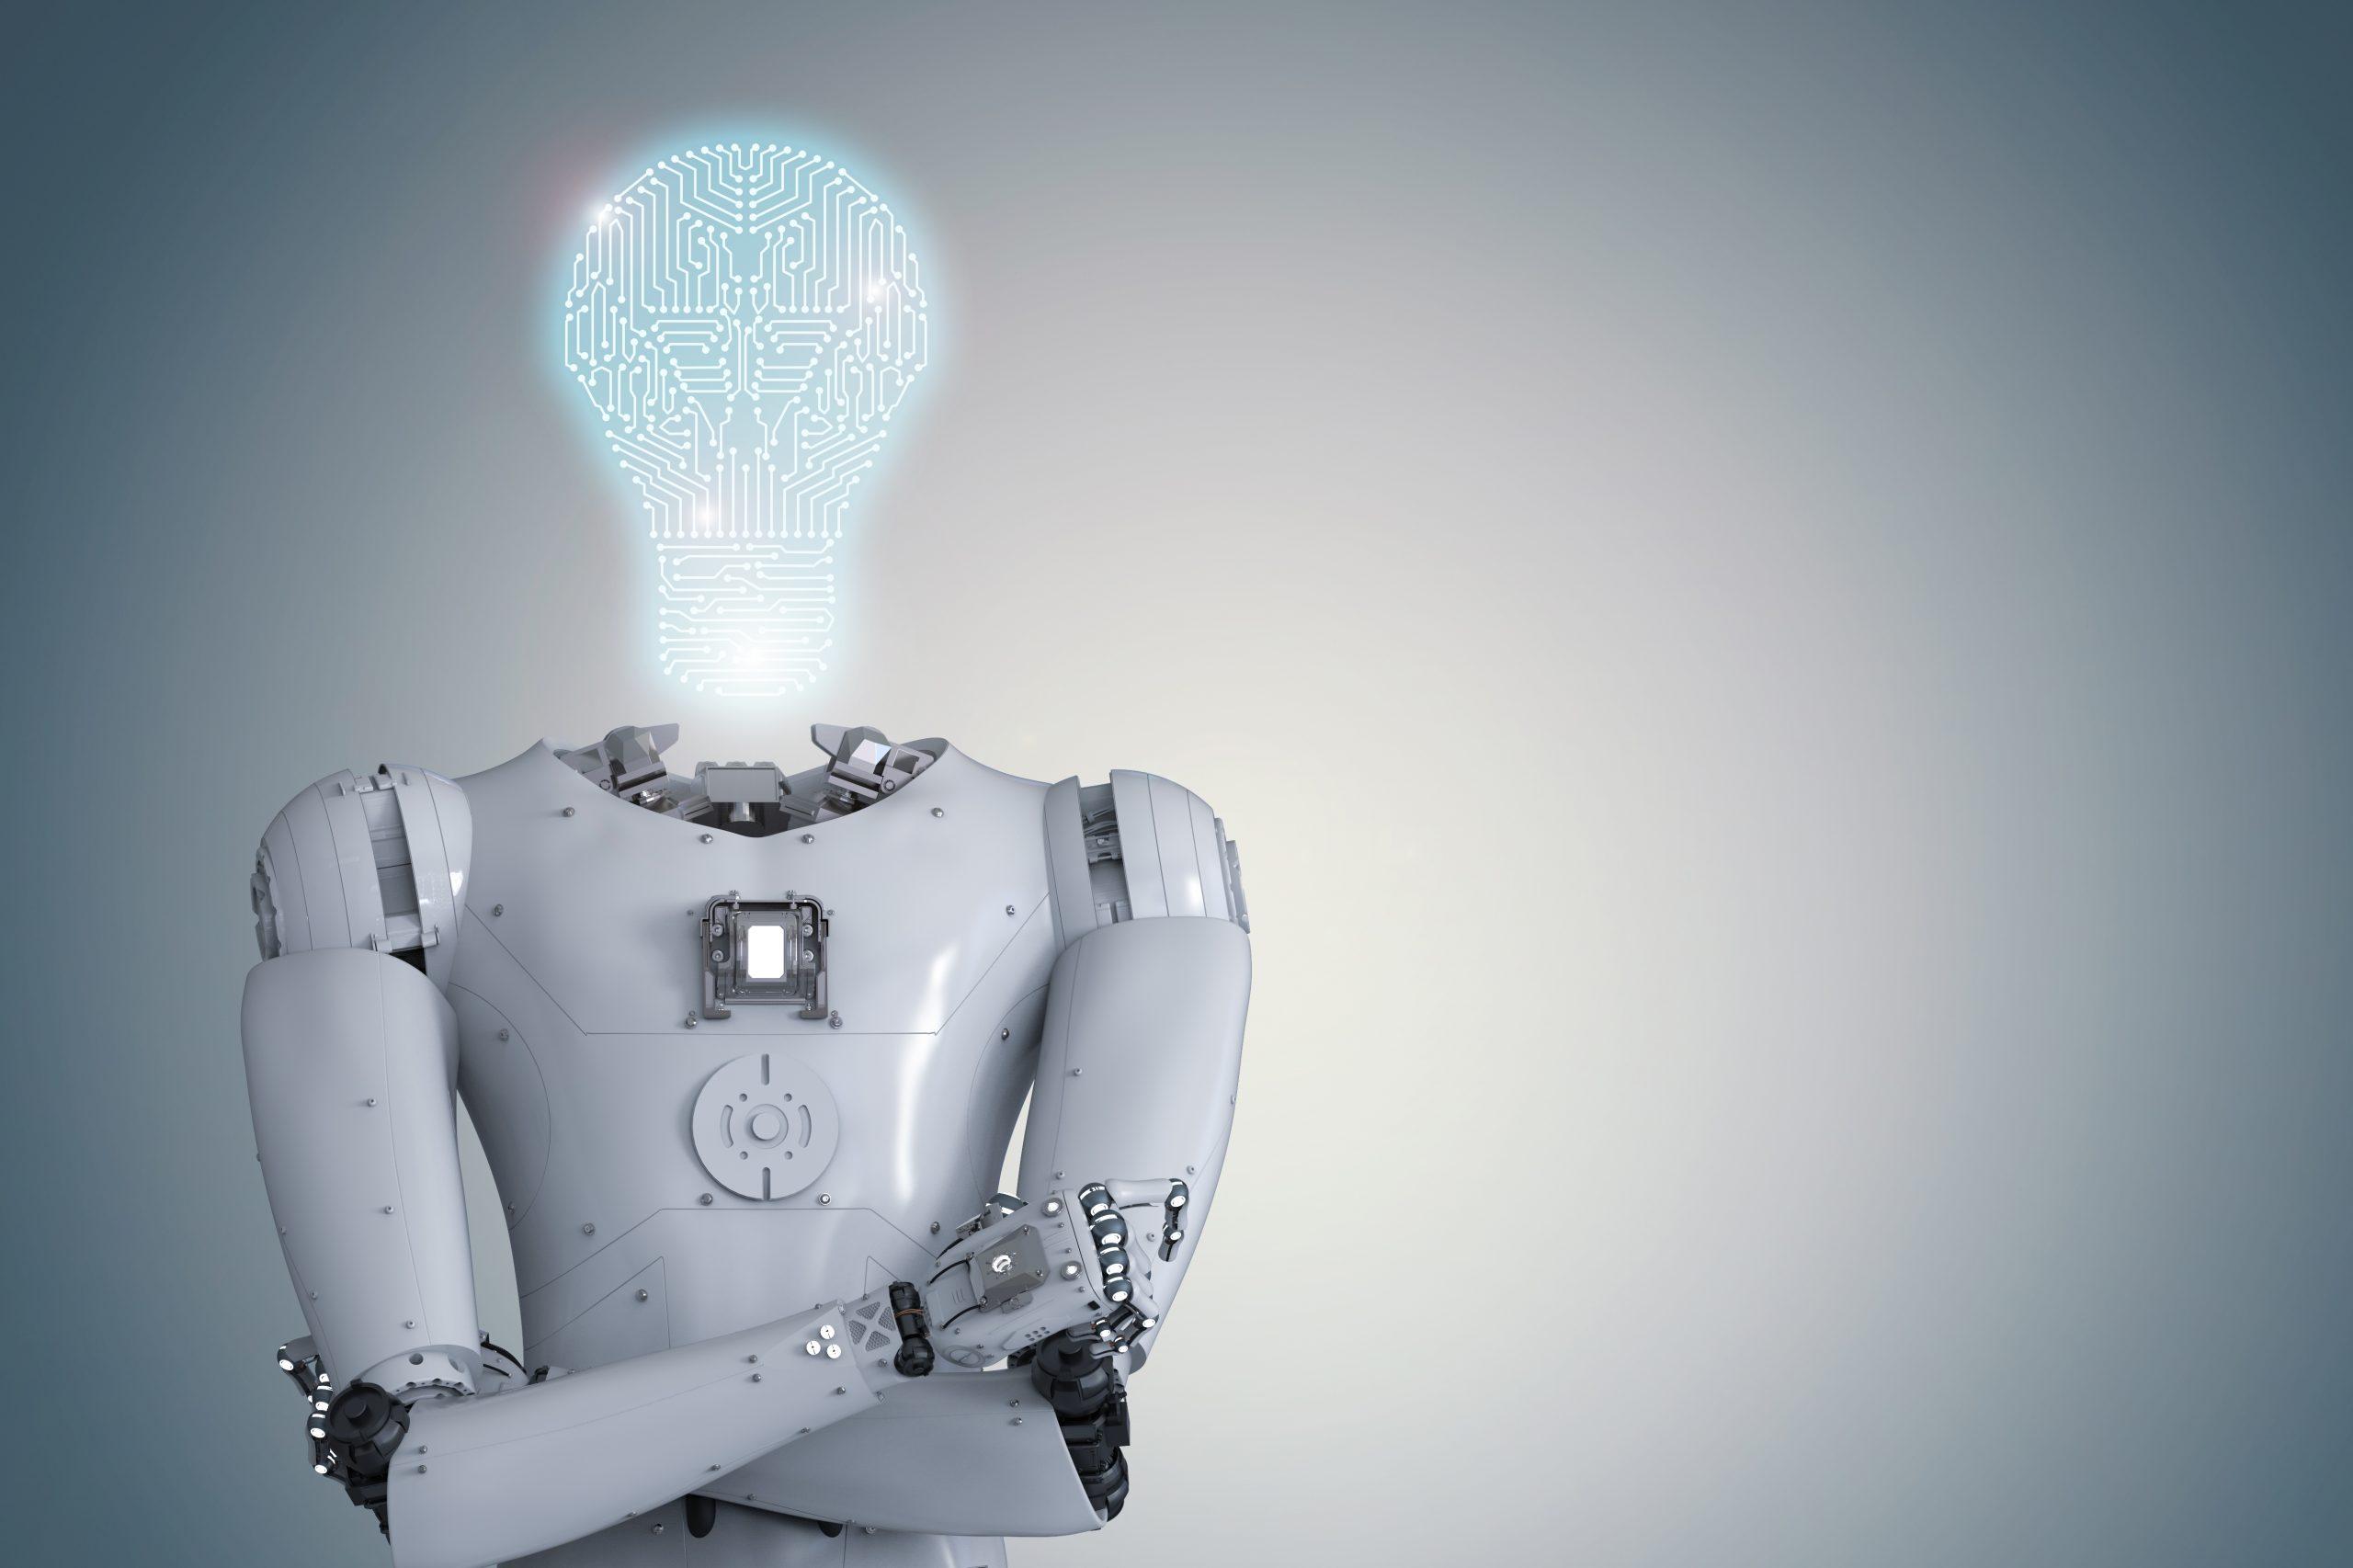 AISITA - https://depositphotos.com/168275348/stock-photo-artificial-intelligence-idea.html